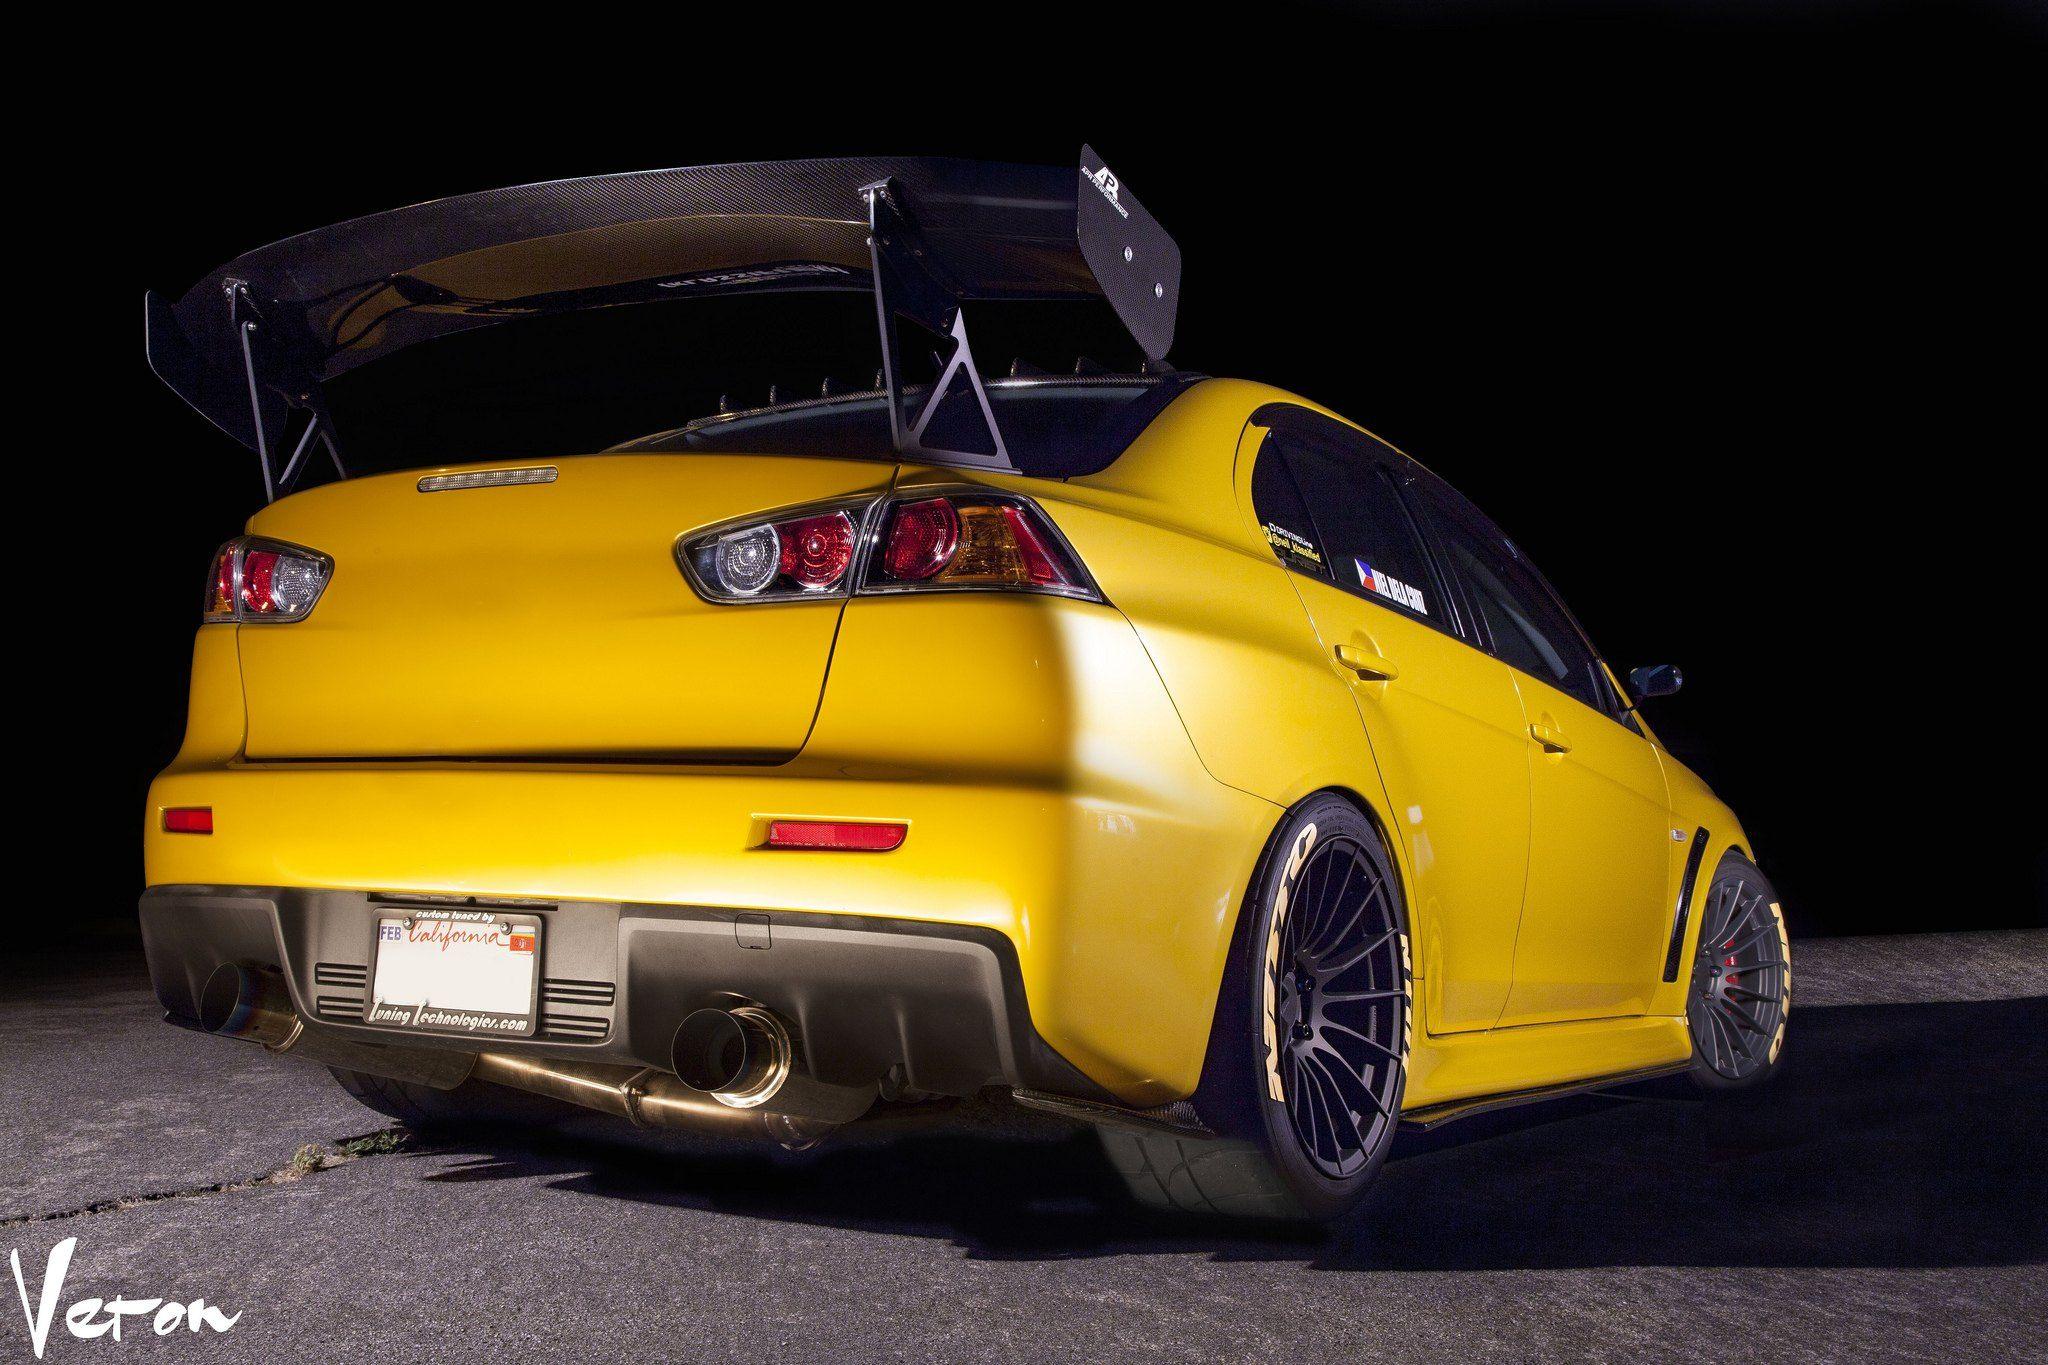 Aftermarket Parts Transform Yellow Mitsubishi Evolution